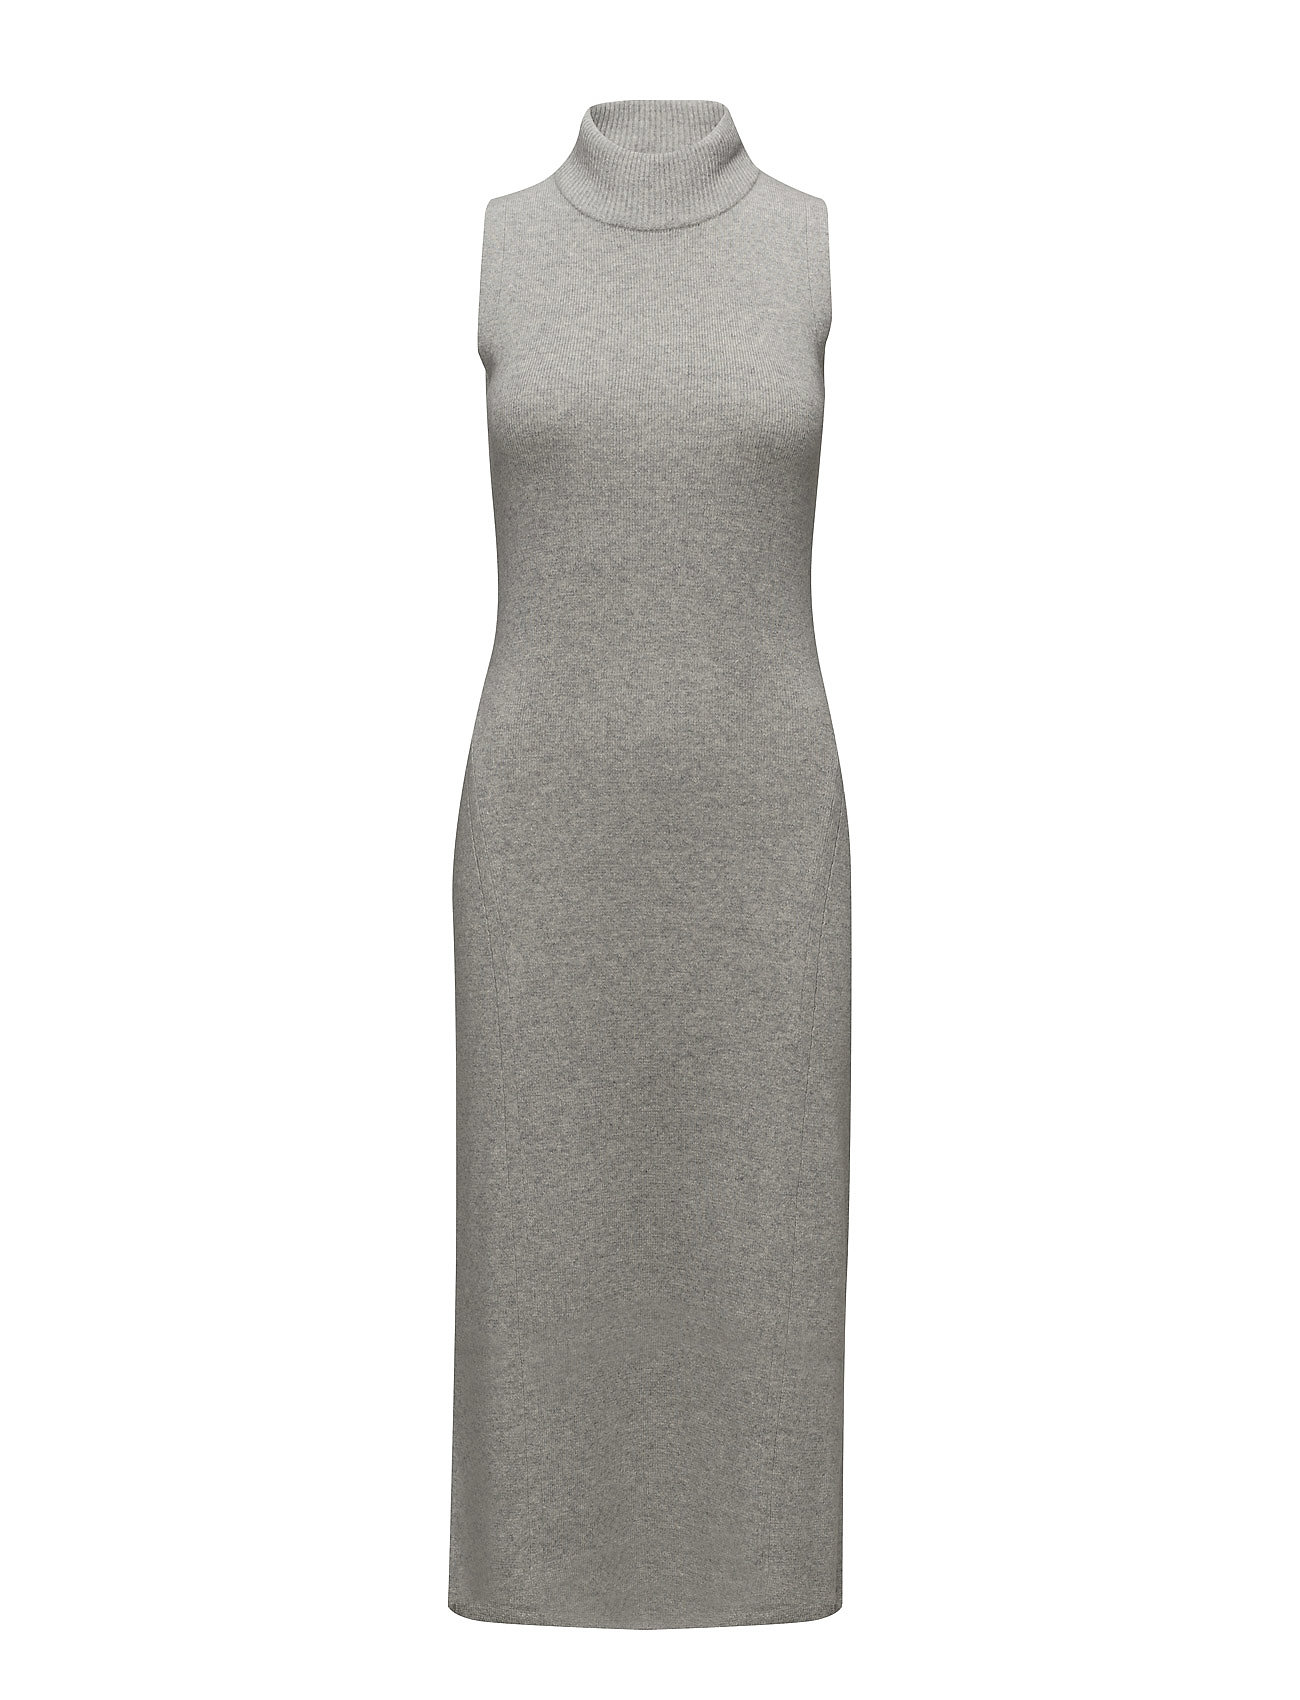 Ace cashmere dress fra rag & bone fra boozt.com dk